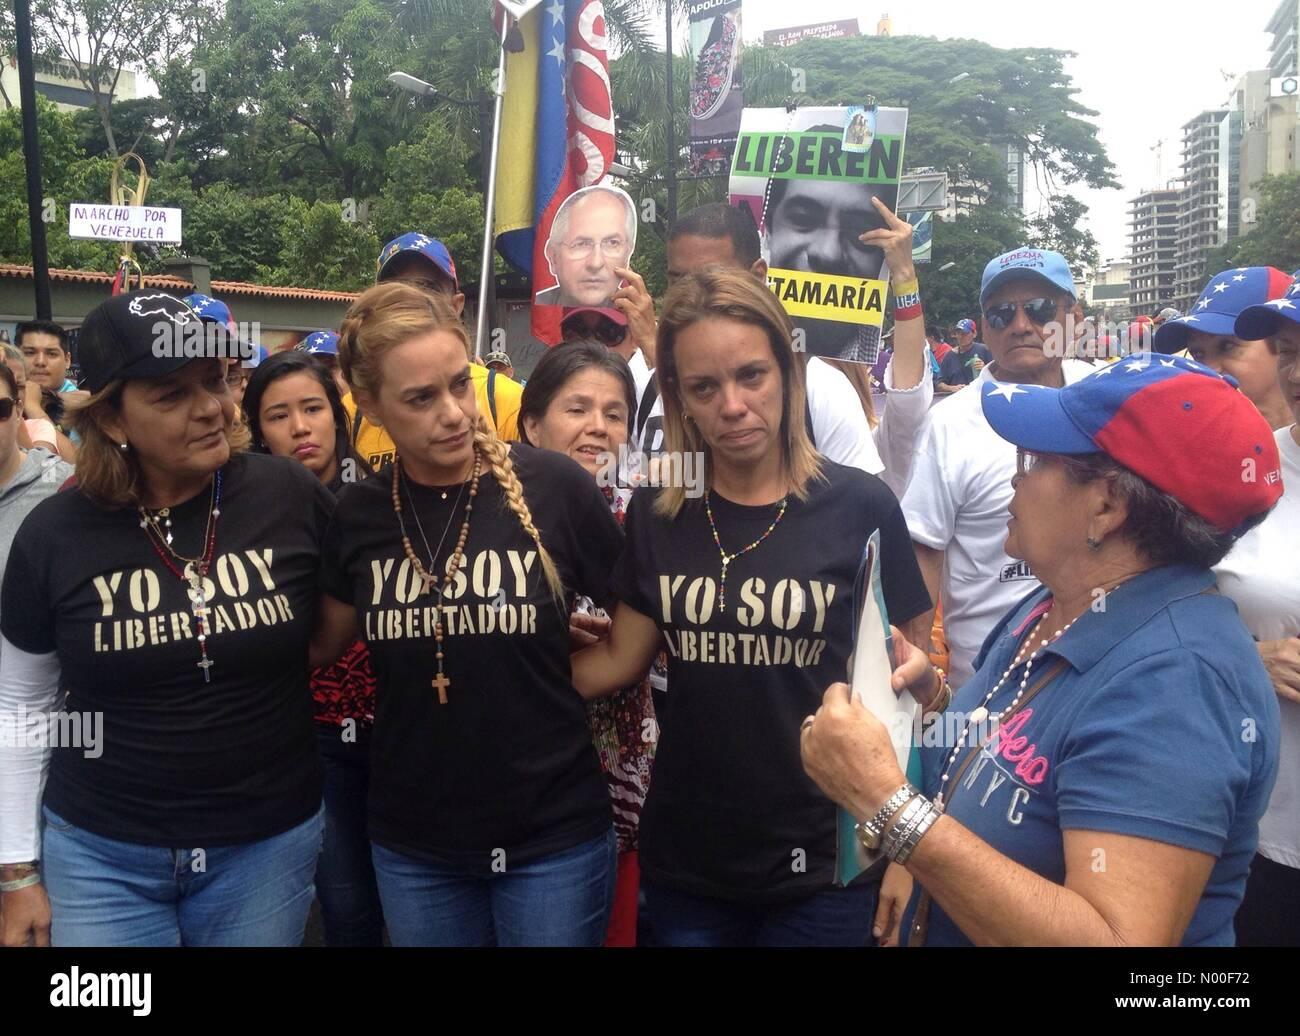 Caracas, Distrito Capital, Venezuela. 17th June, 2017. Lilian Tintori wife of Venezuelan opposition leader Leopoldo - Stock Image